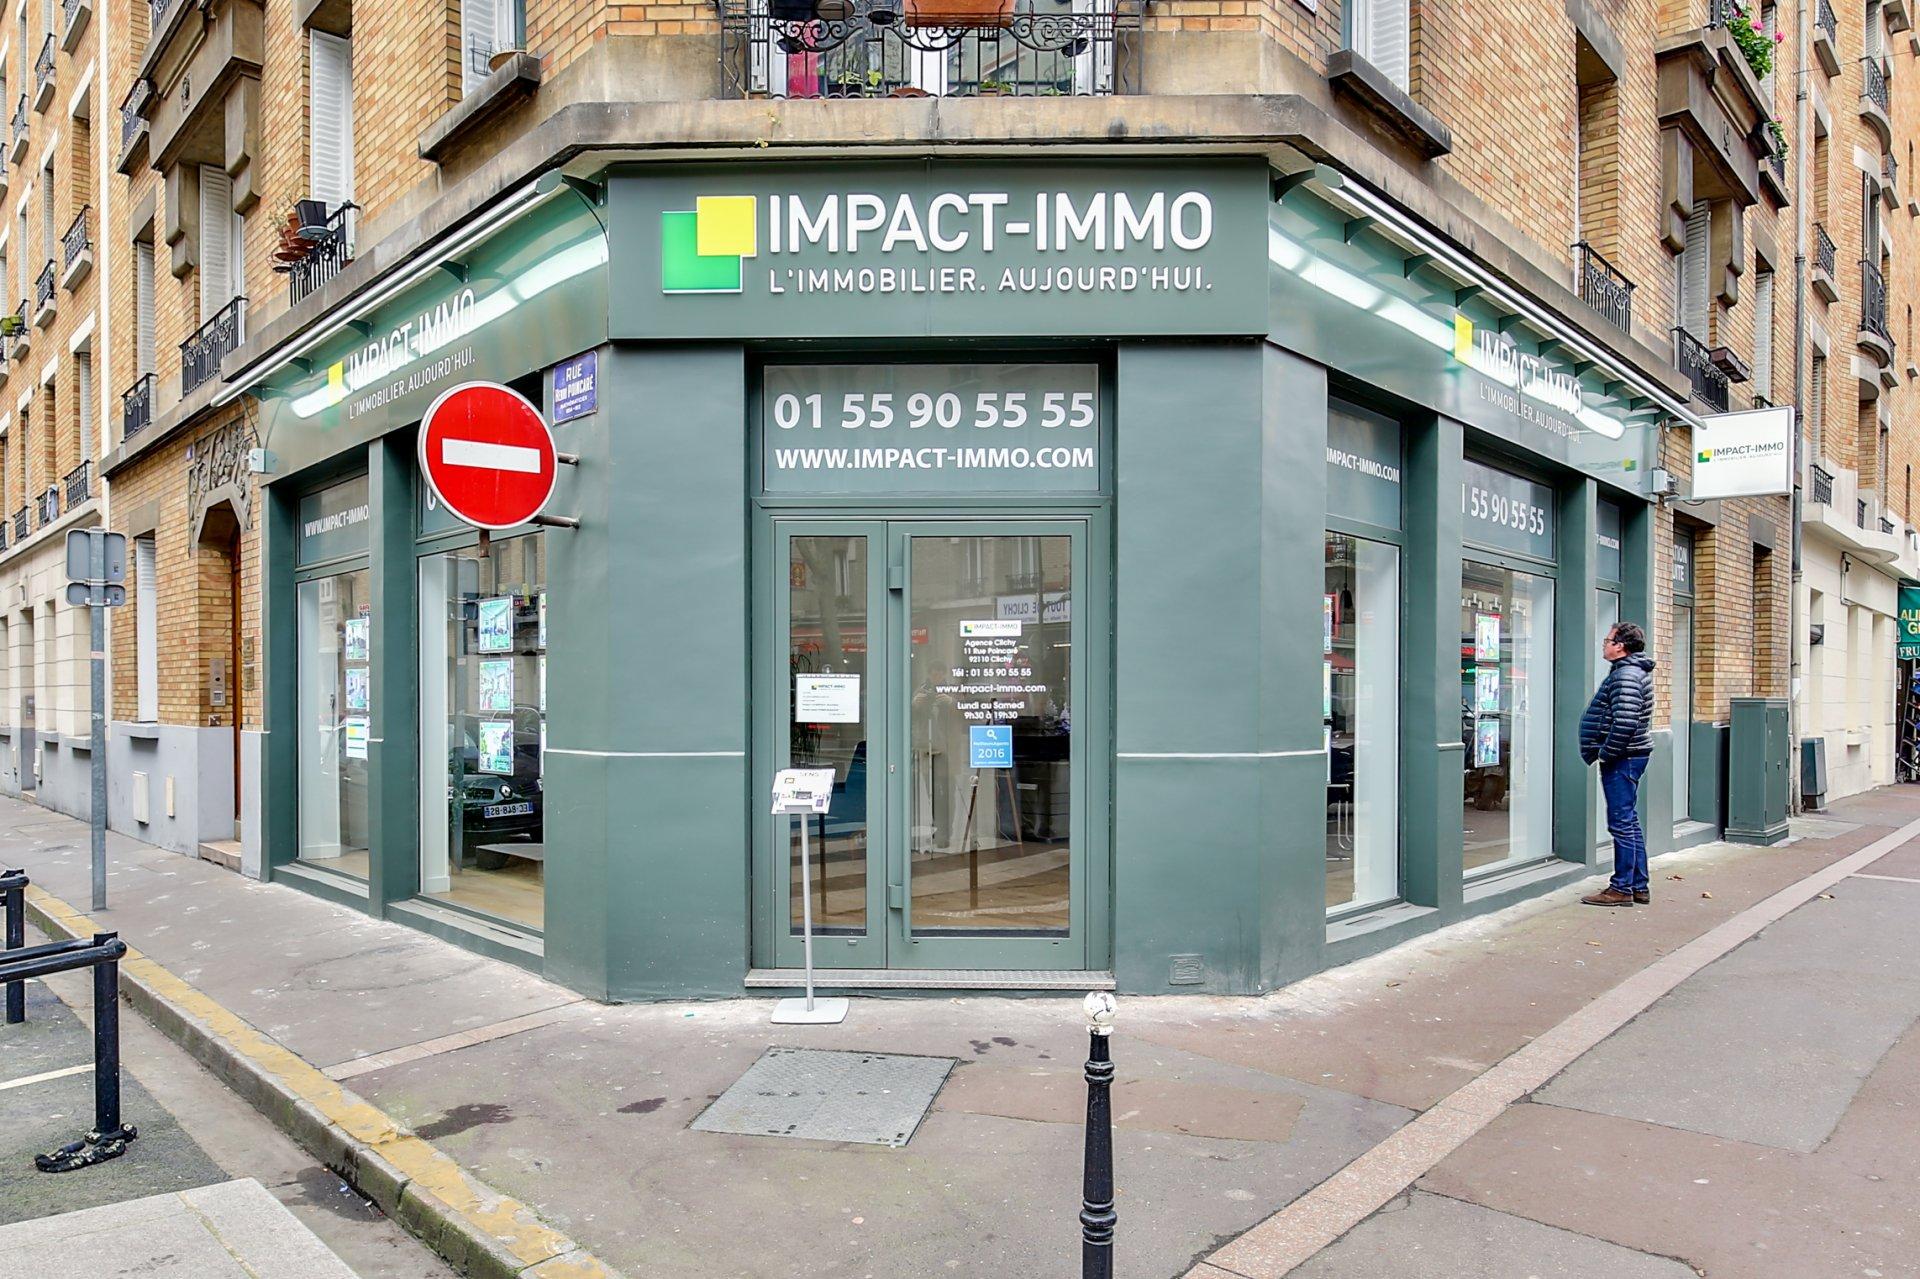 IMPACT IMMO CLICHY